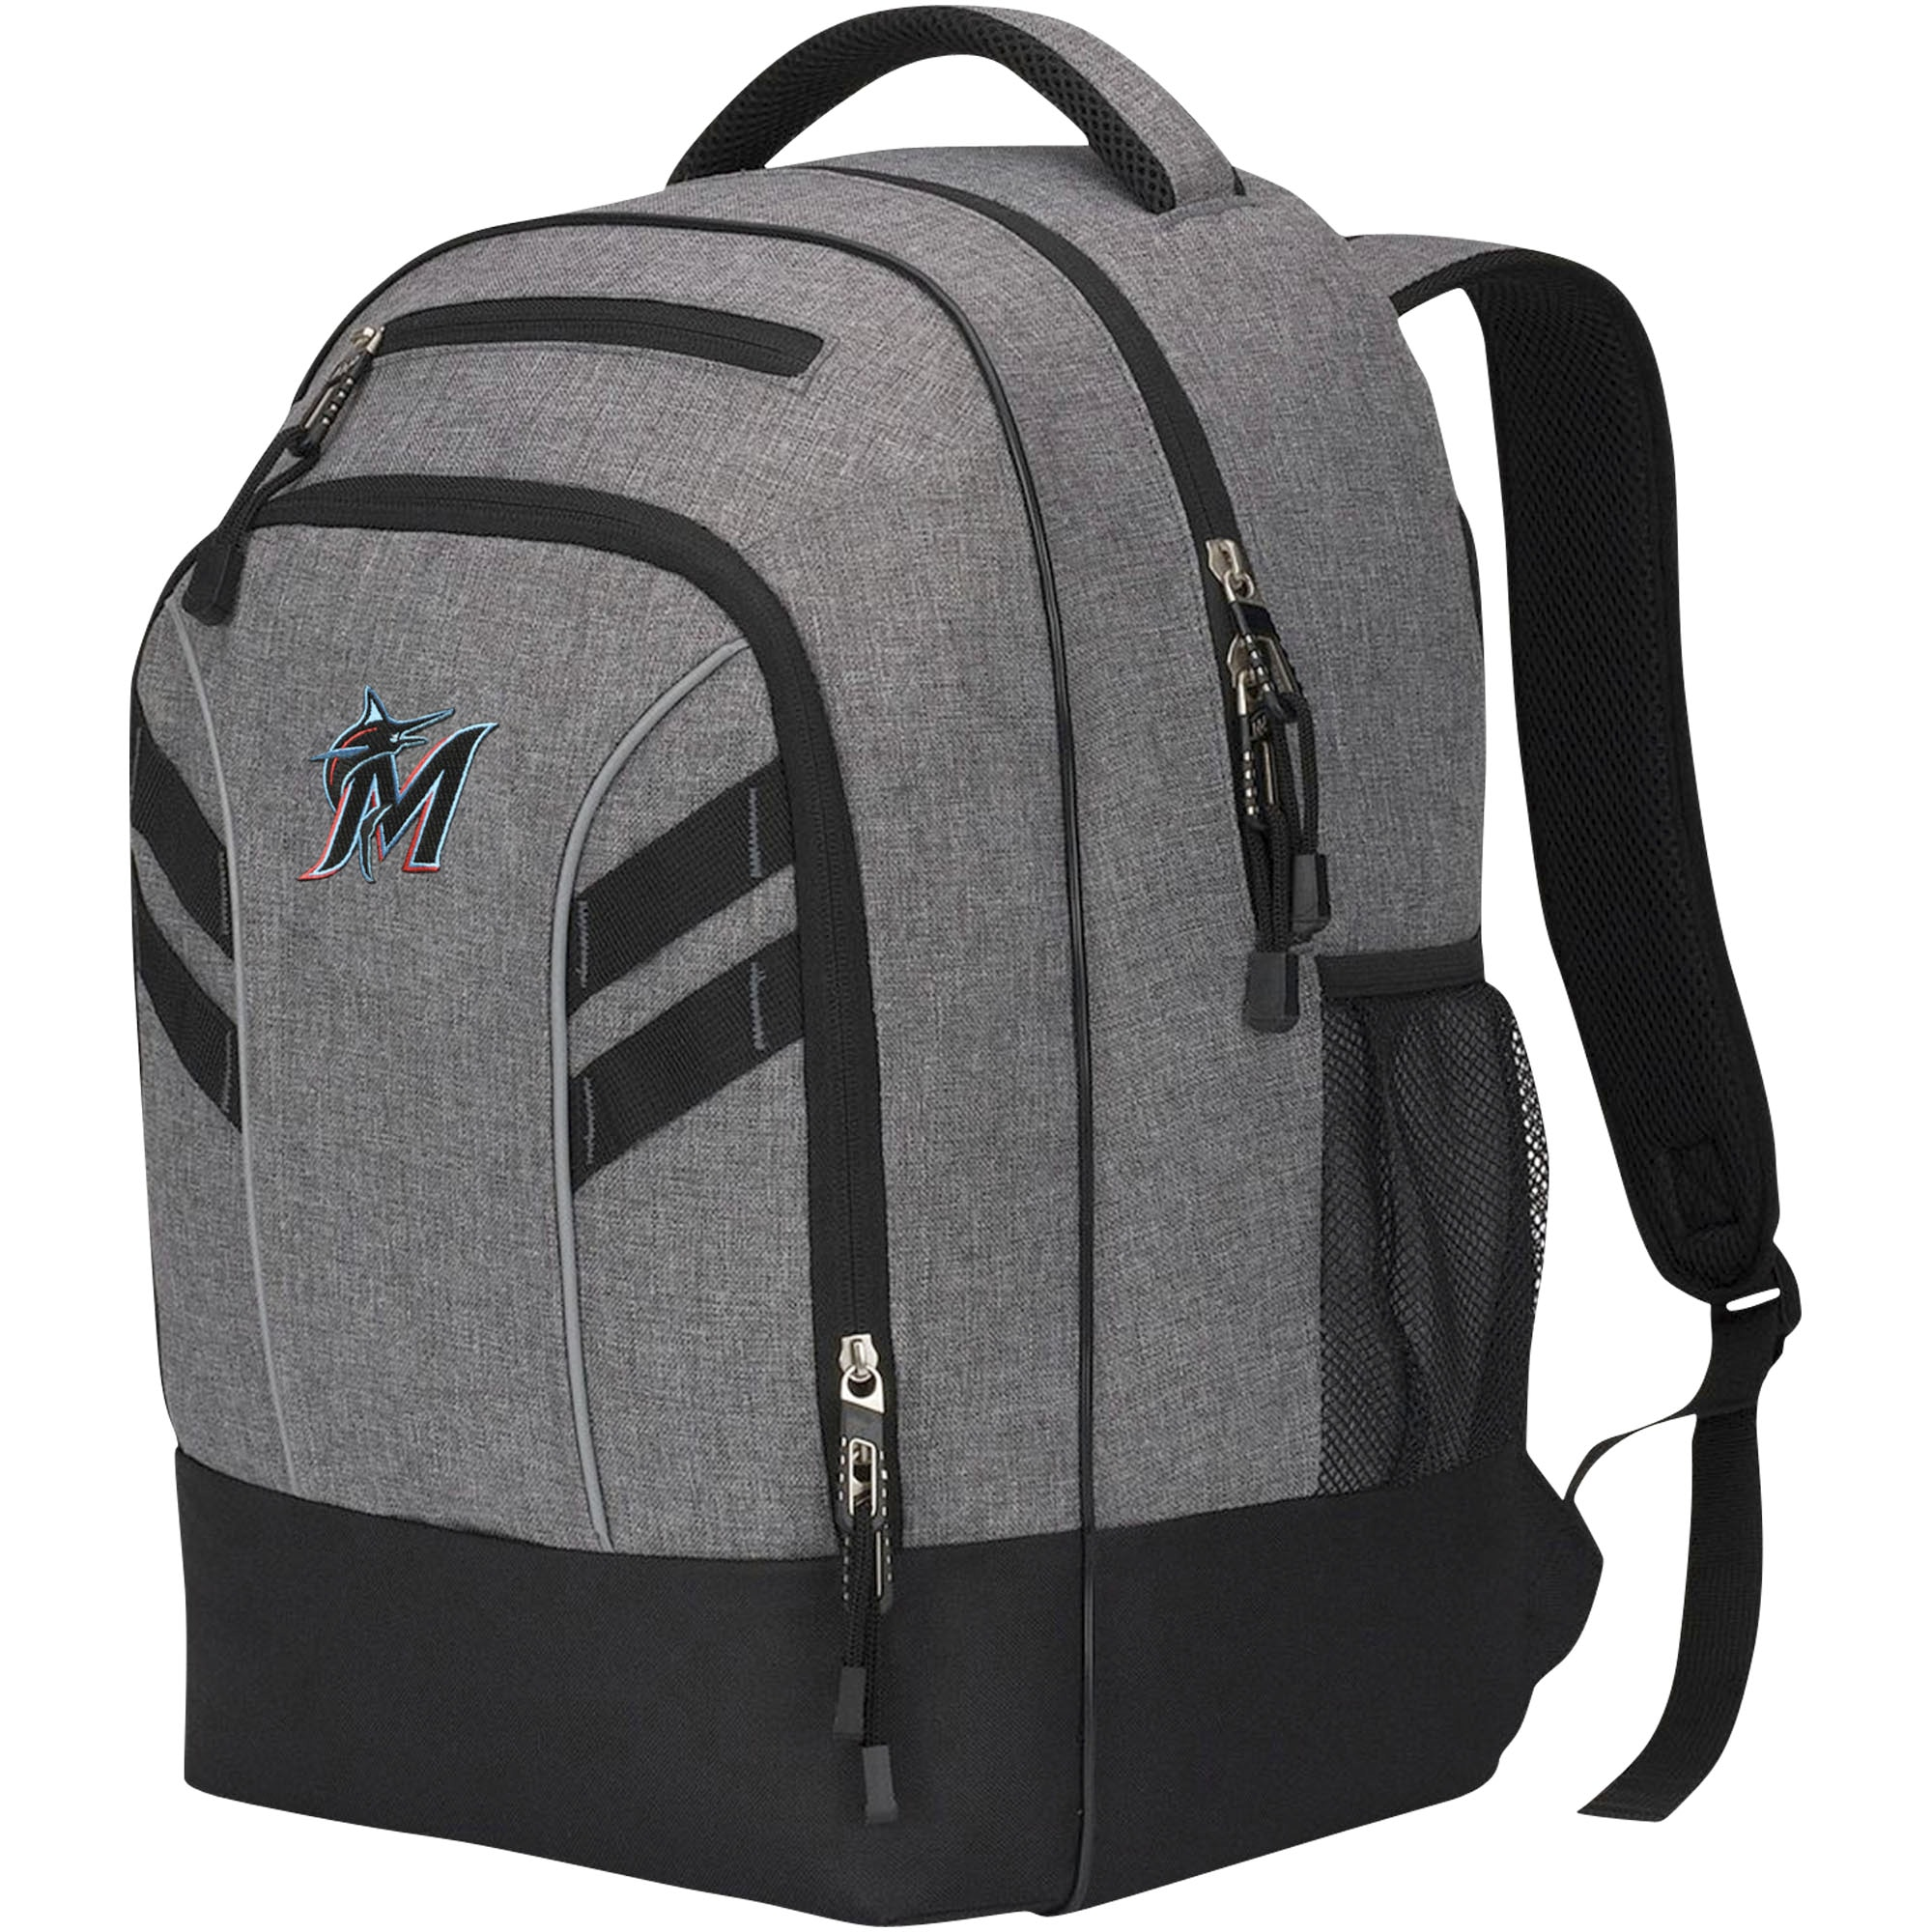 Miami Marlins The Northwest Company Razor Backpack